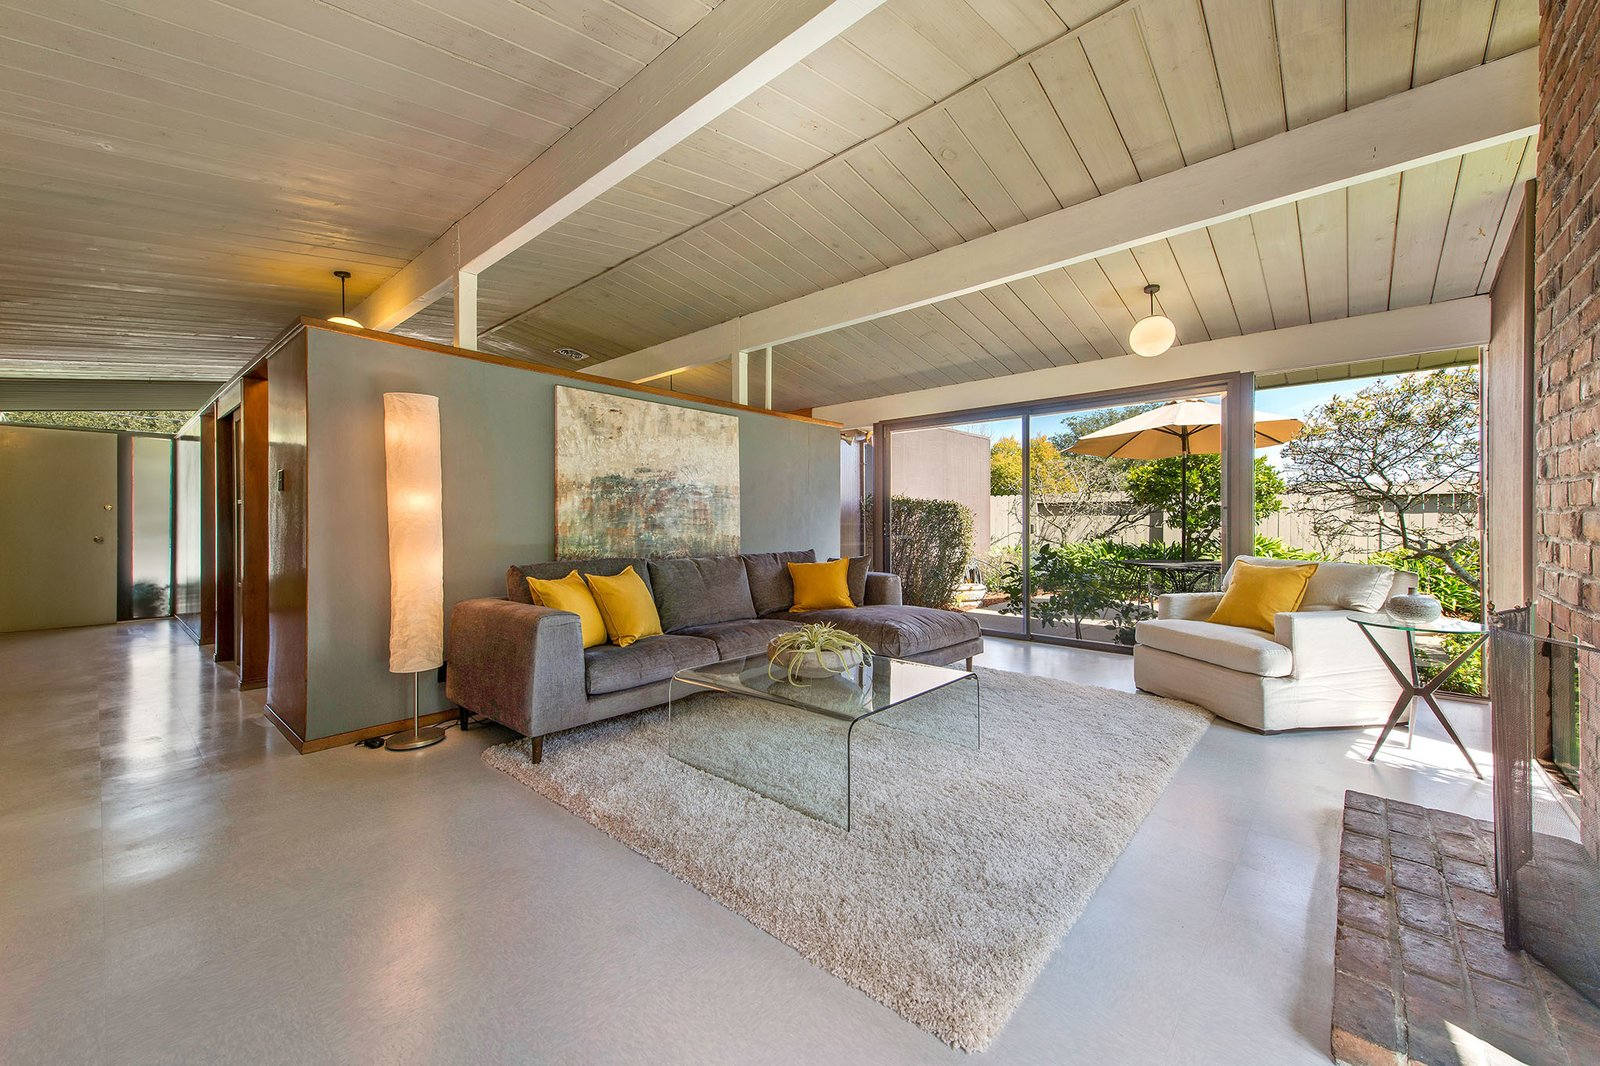 San Rafael Eichler Home living room